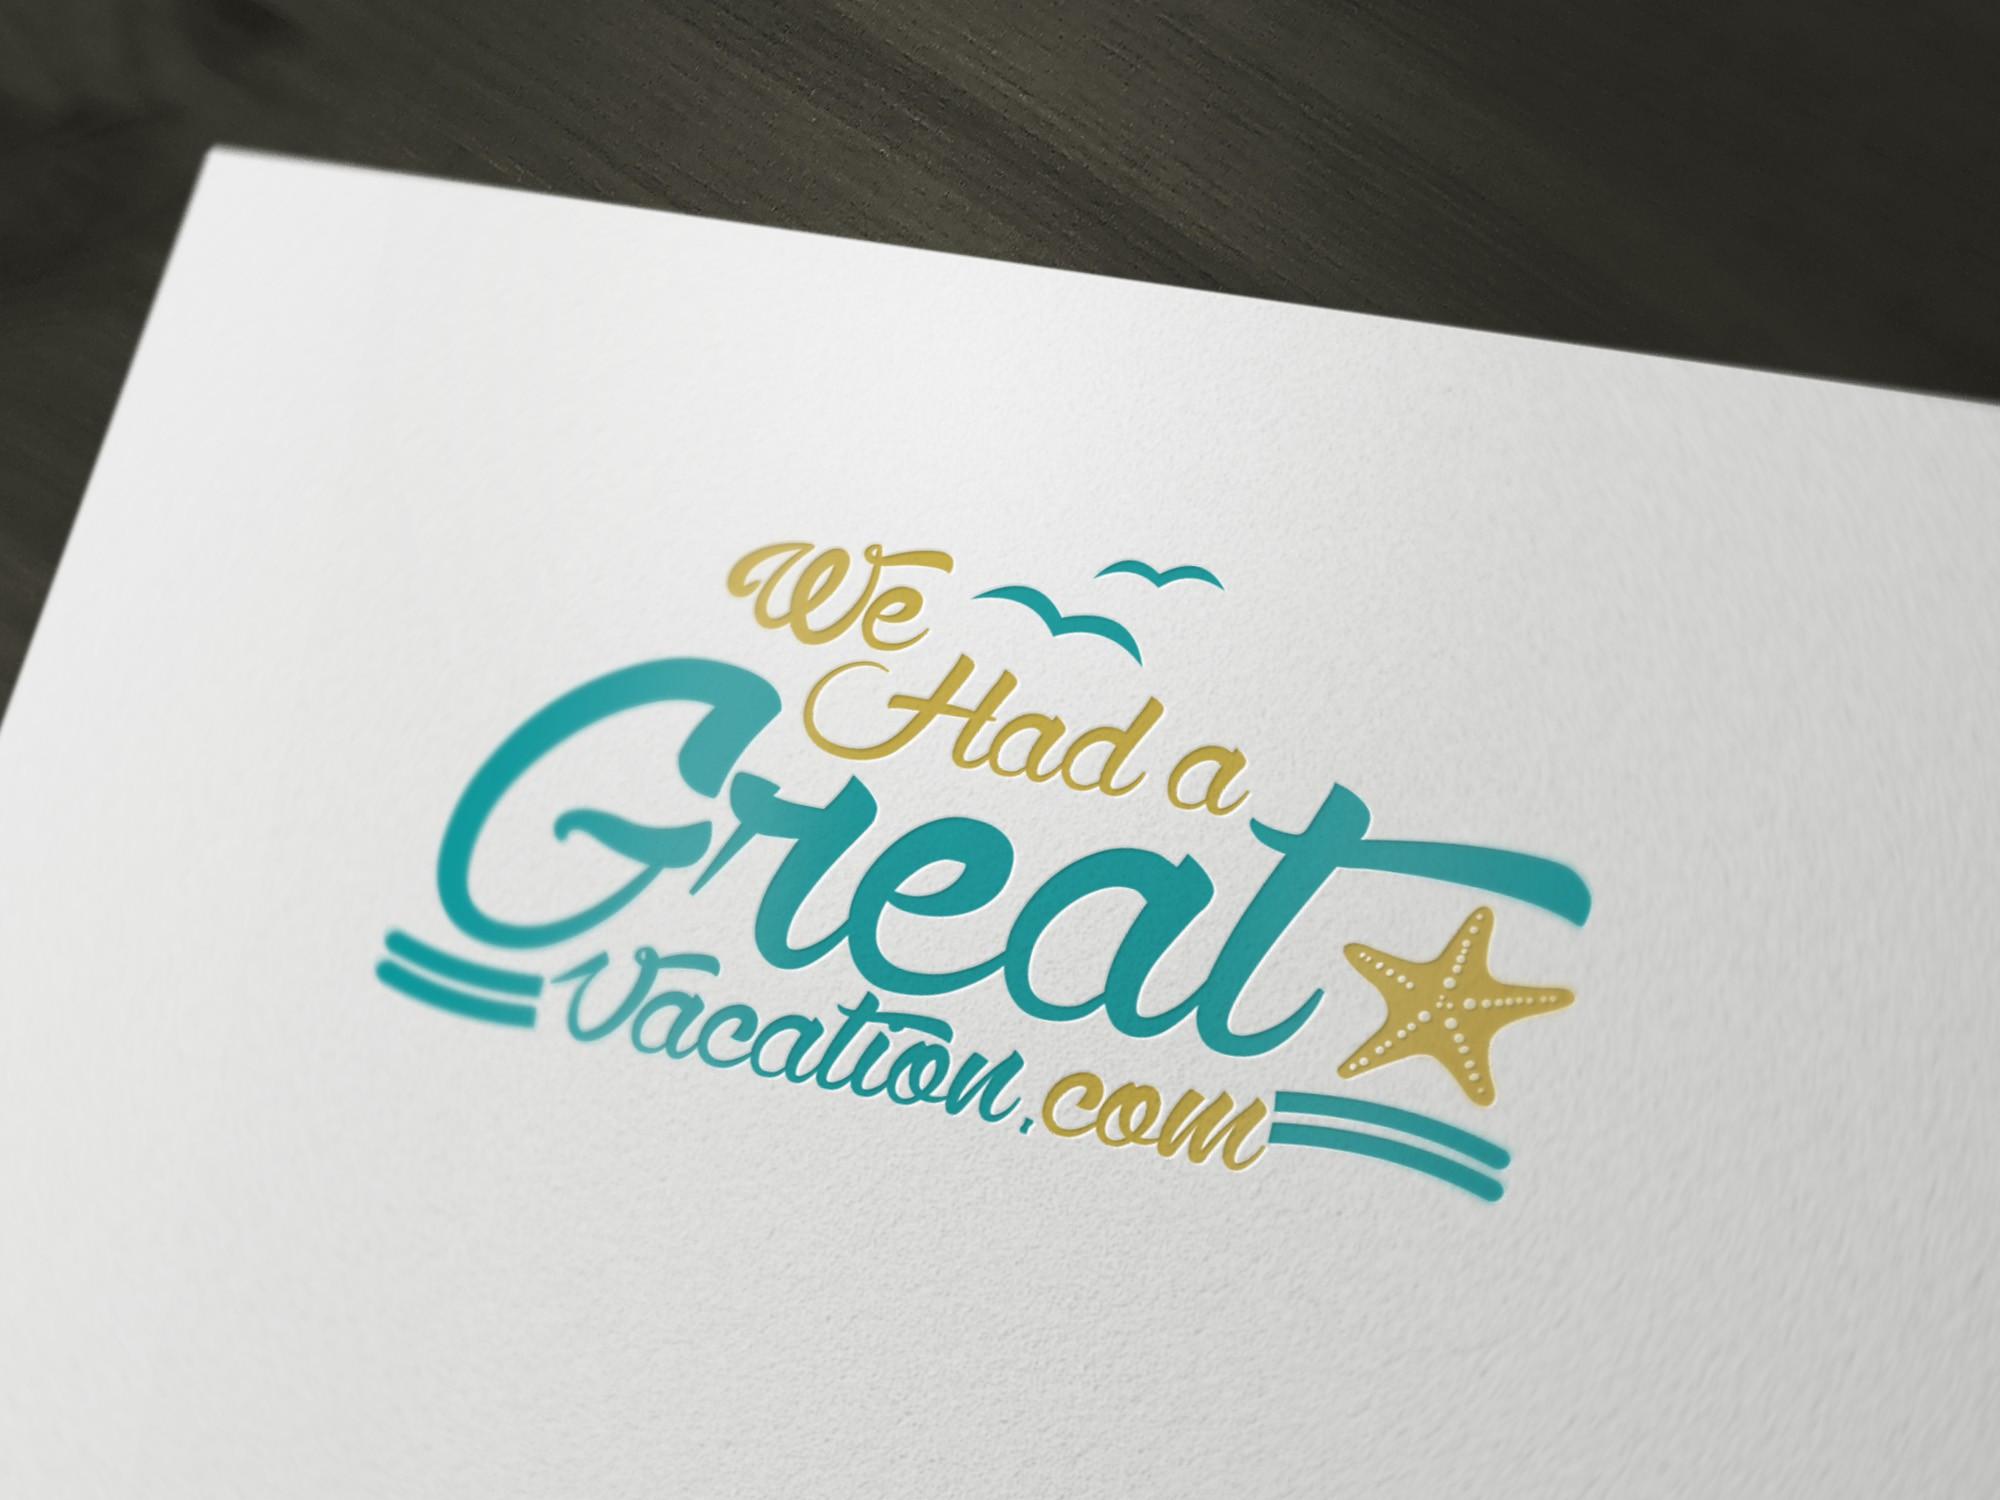 Logo for WeHadaGreatVacation.com